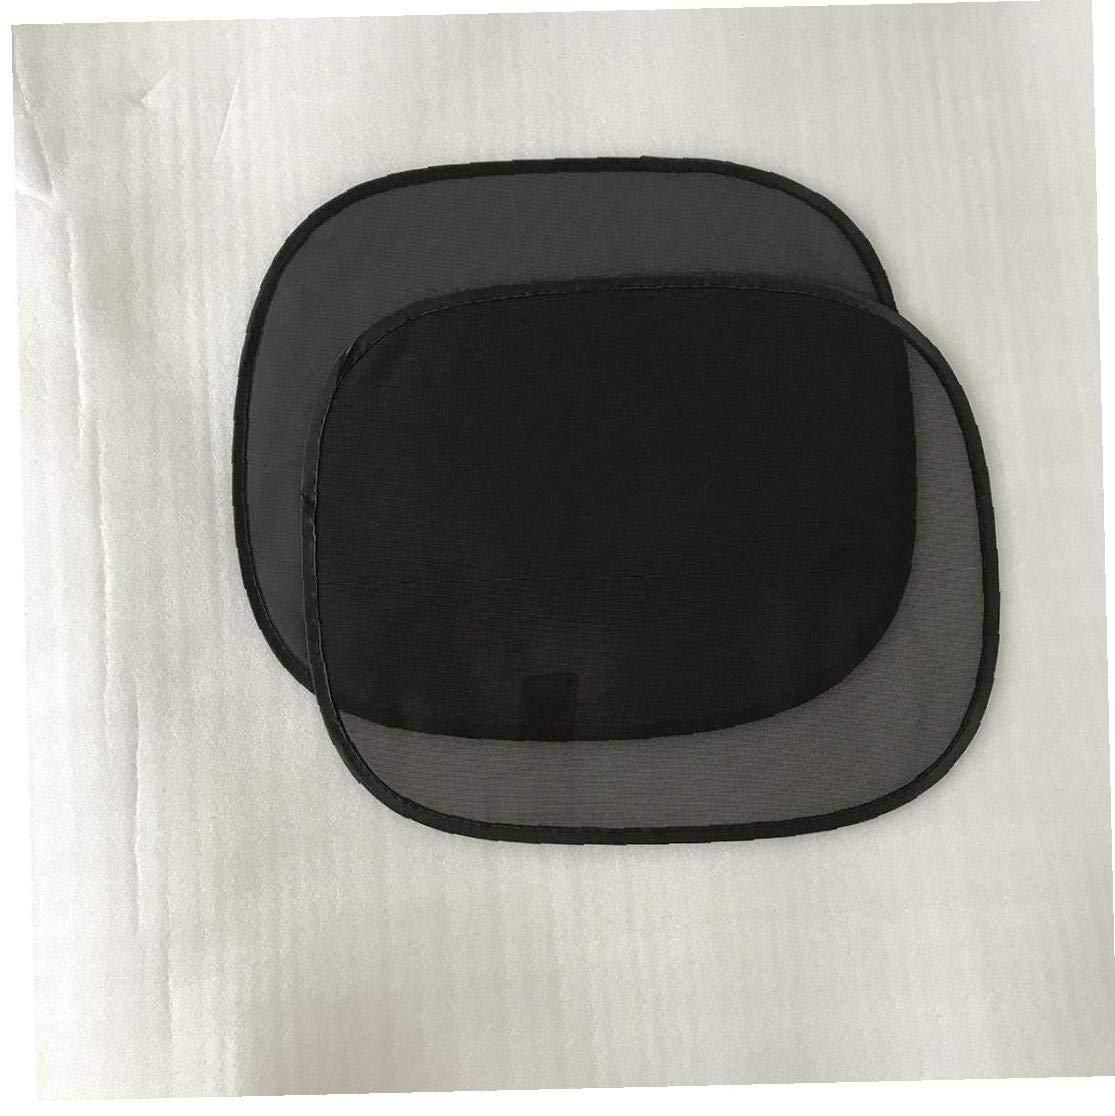 4 Pc//Sistema Tiny Sombrilla del Coche Negro YZLSM Ventana De Coche De Coches Sombrillas para Bloquear M/ás De UV